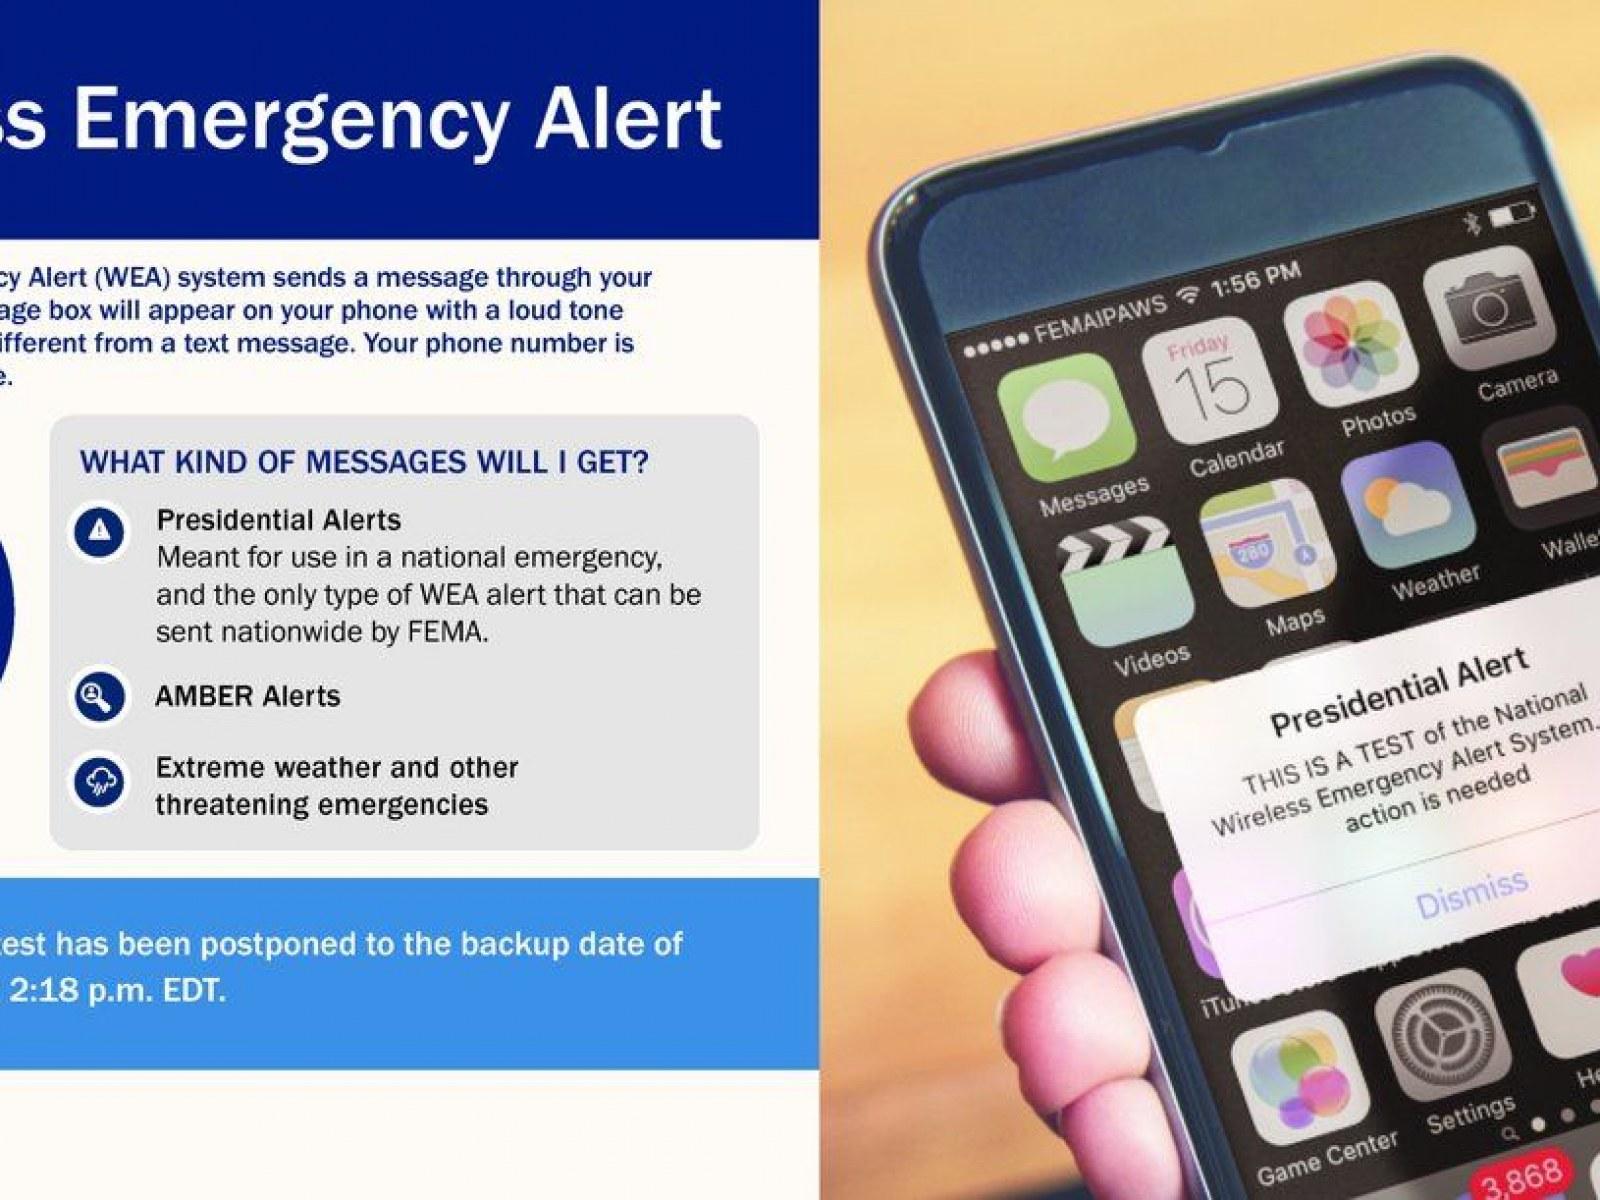 FEMA 'Presidential Alert' Text: Can You Turn off Emergency